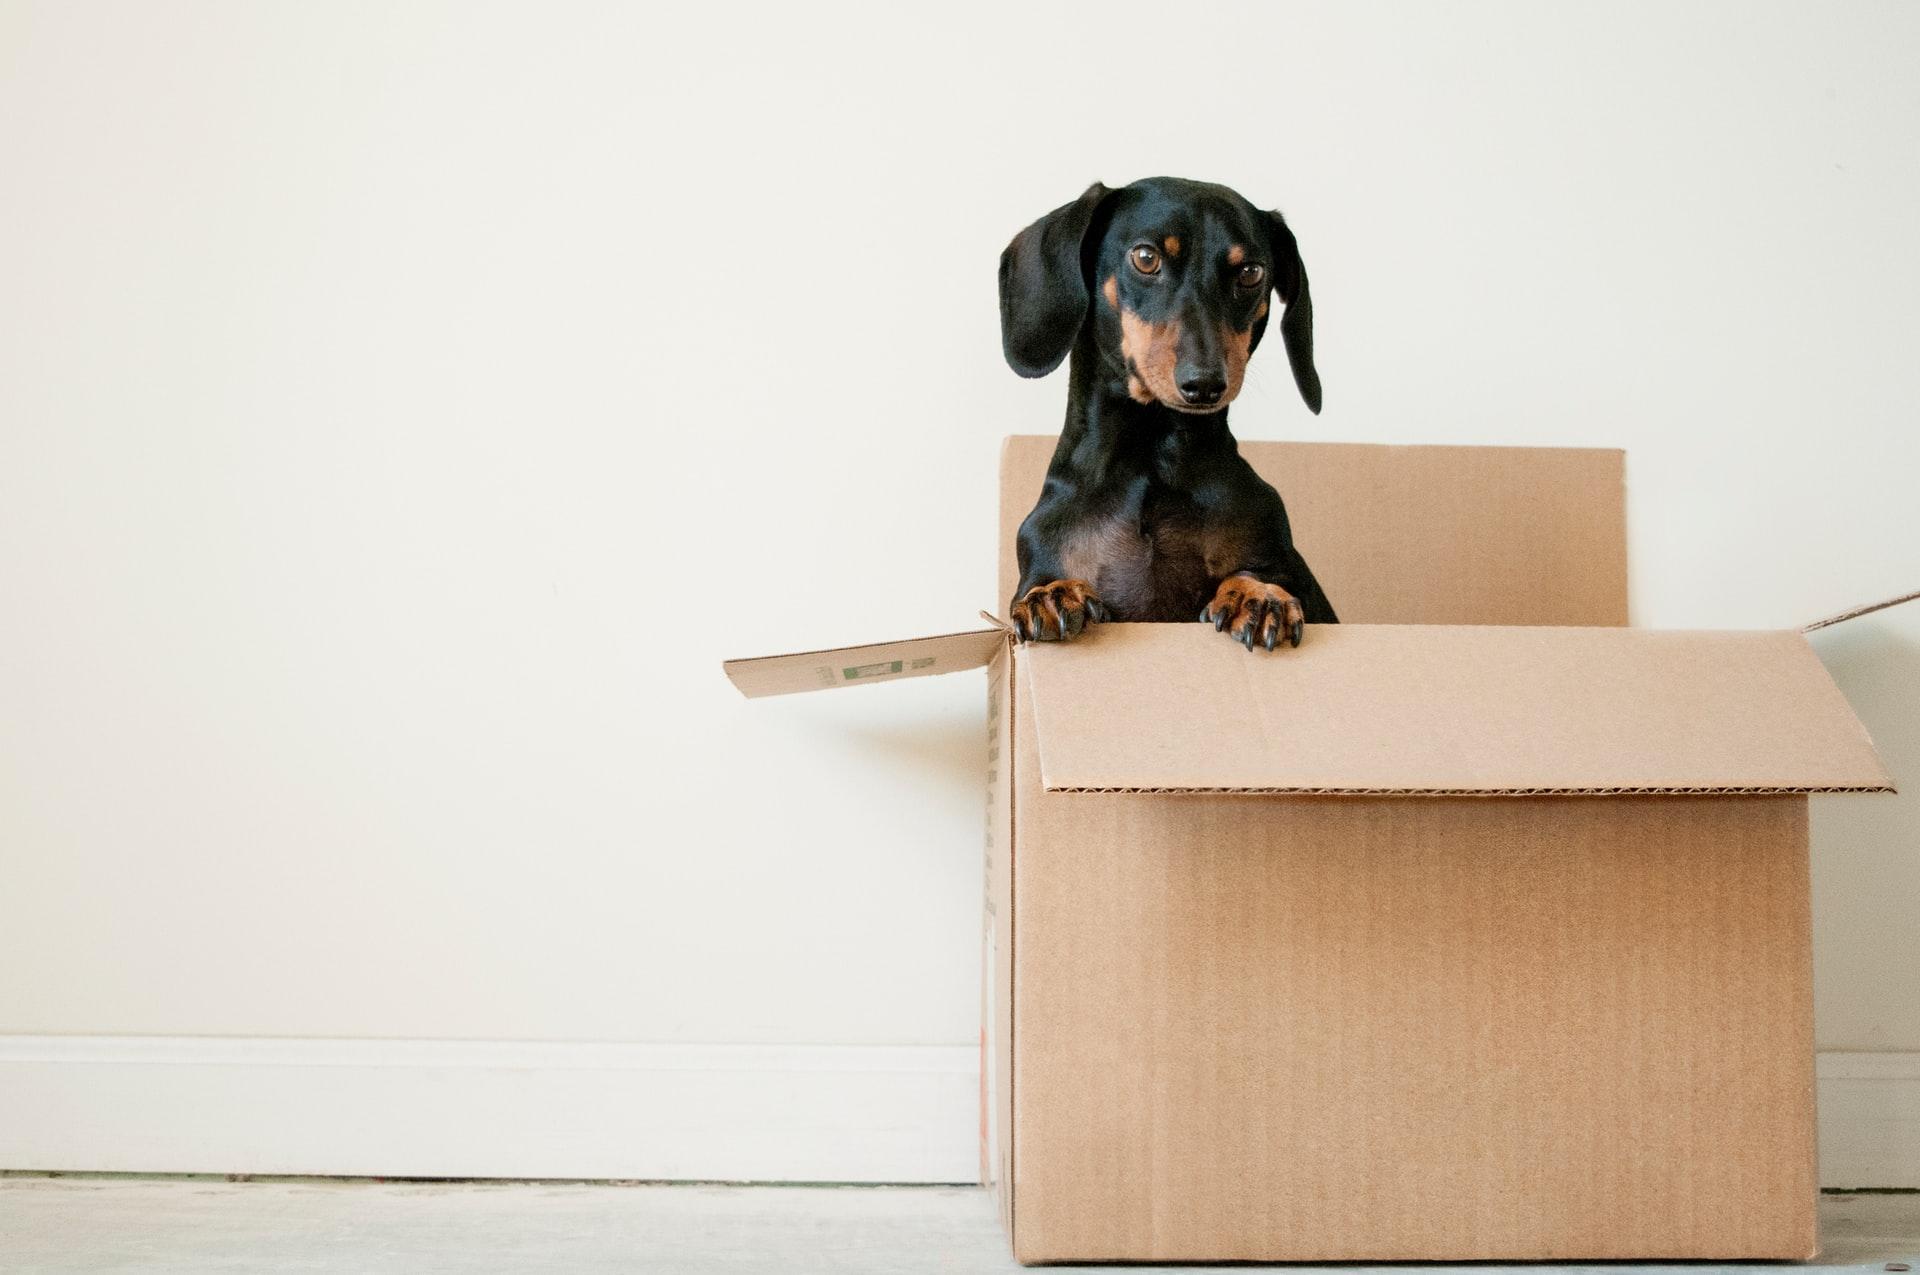 Dog, box, house move, storage